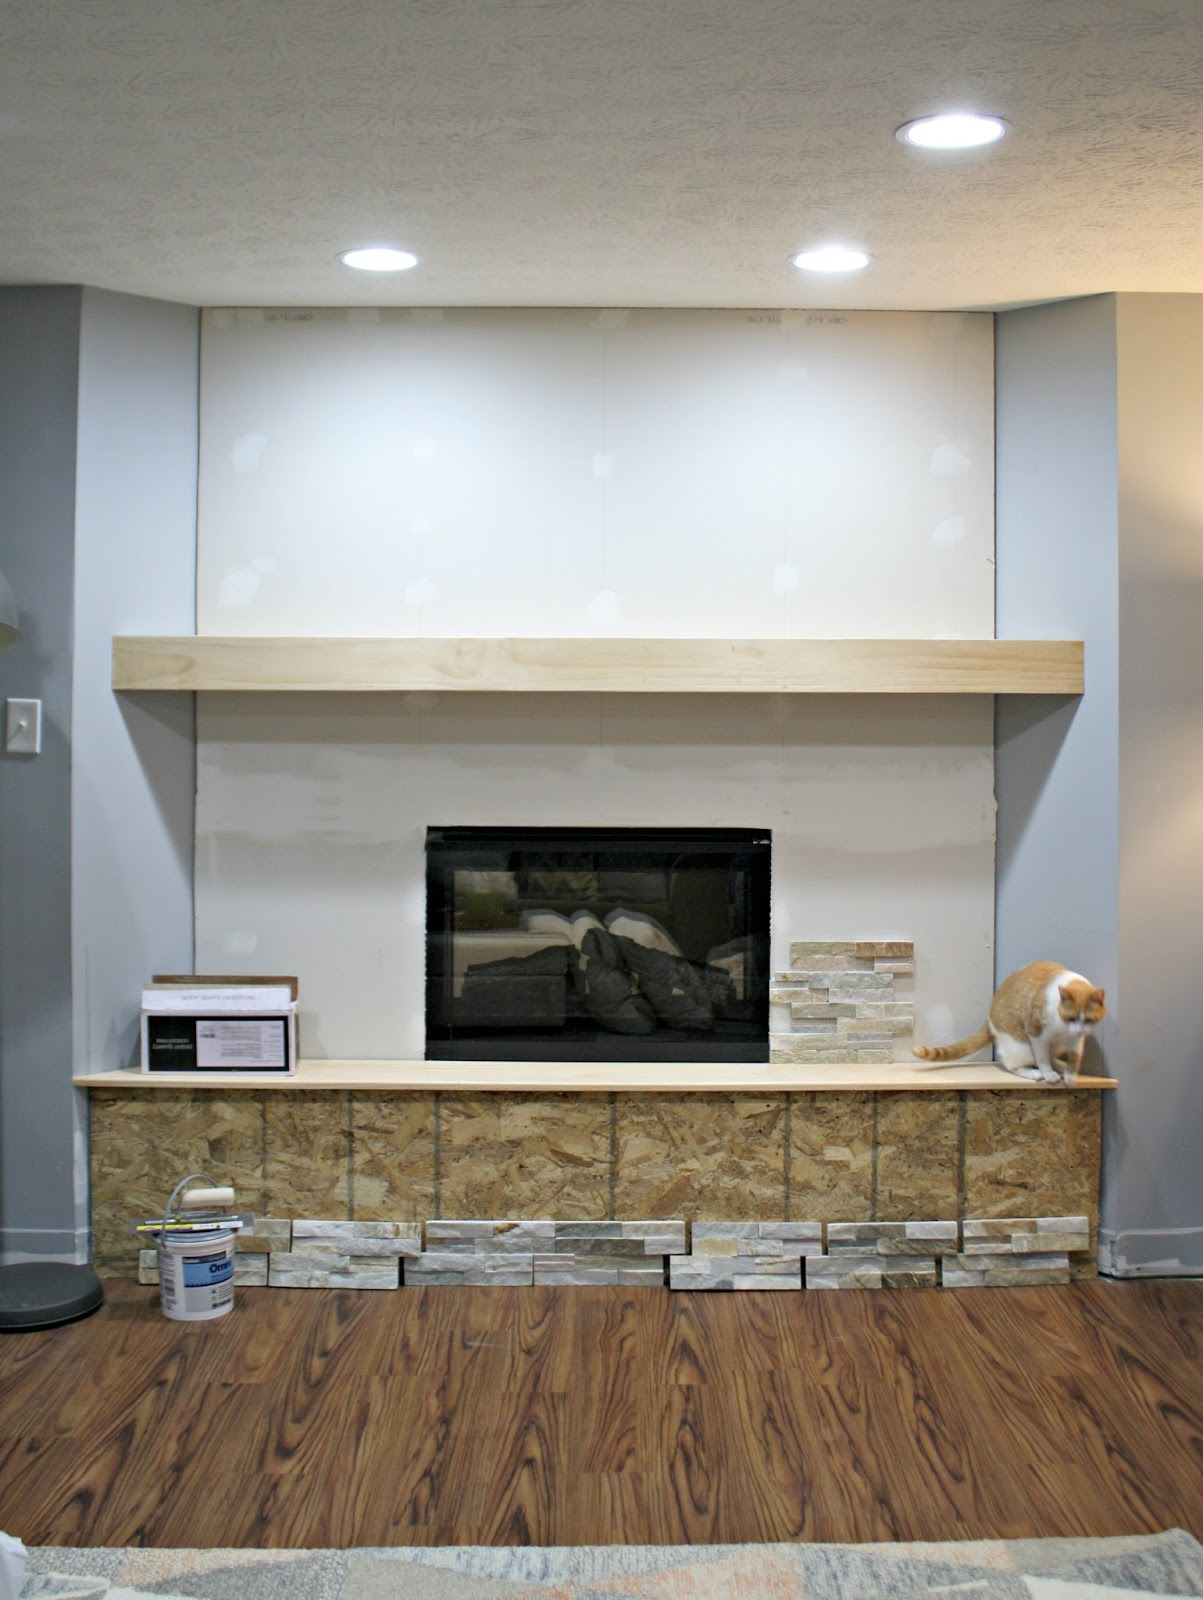 Basement fireplace progress! from Thrifty Decor Chick